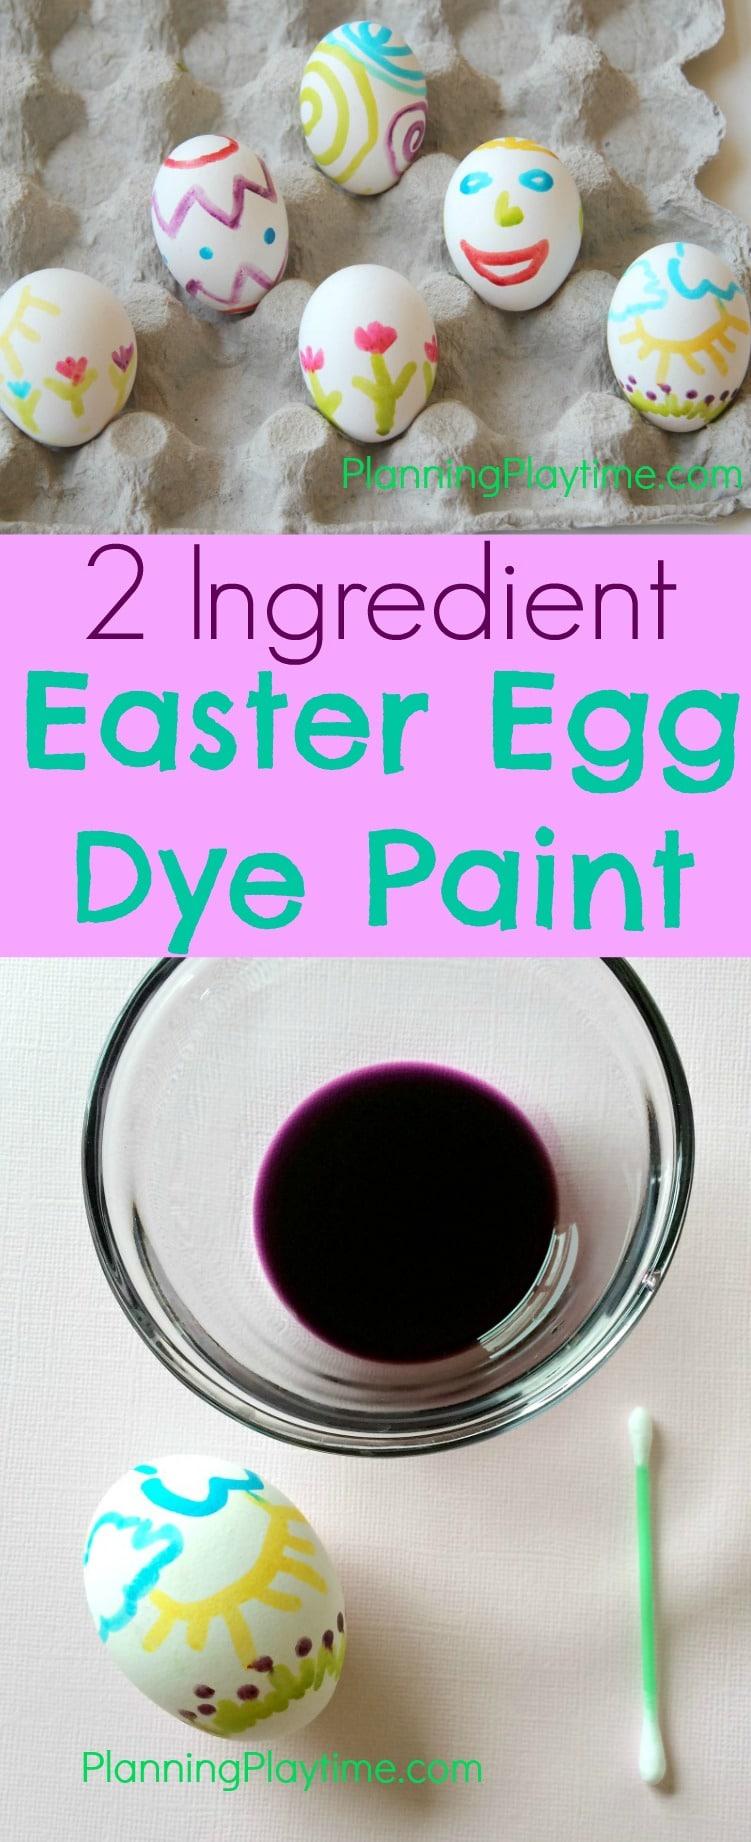 2 Ingredient Easter Egg Dye Paint